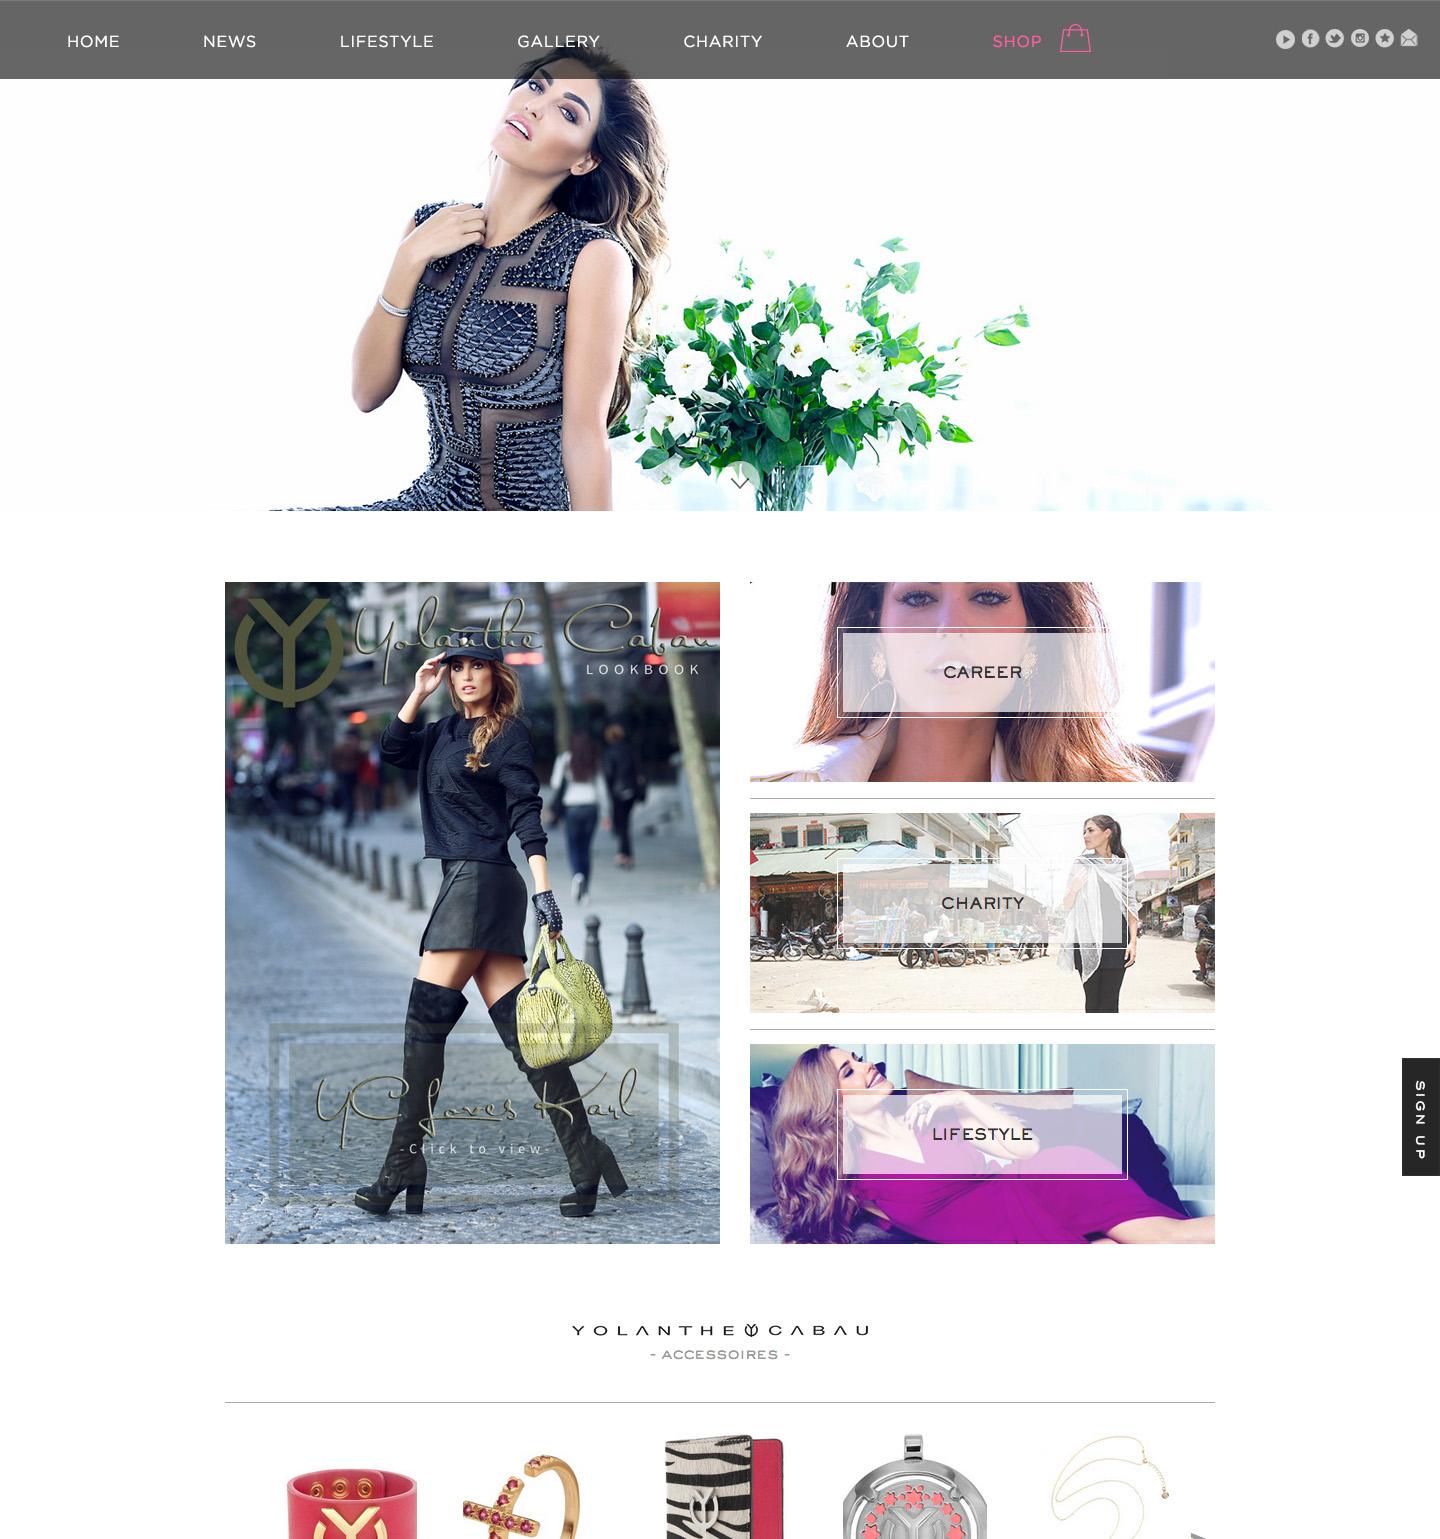 Yolanthe Cabau Homepage - Menu